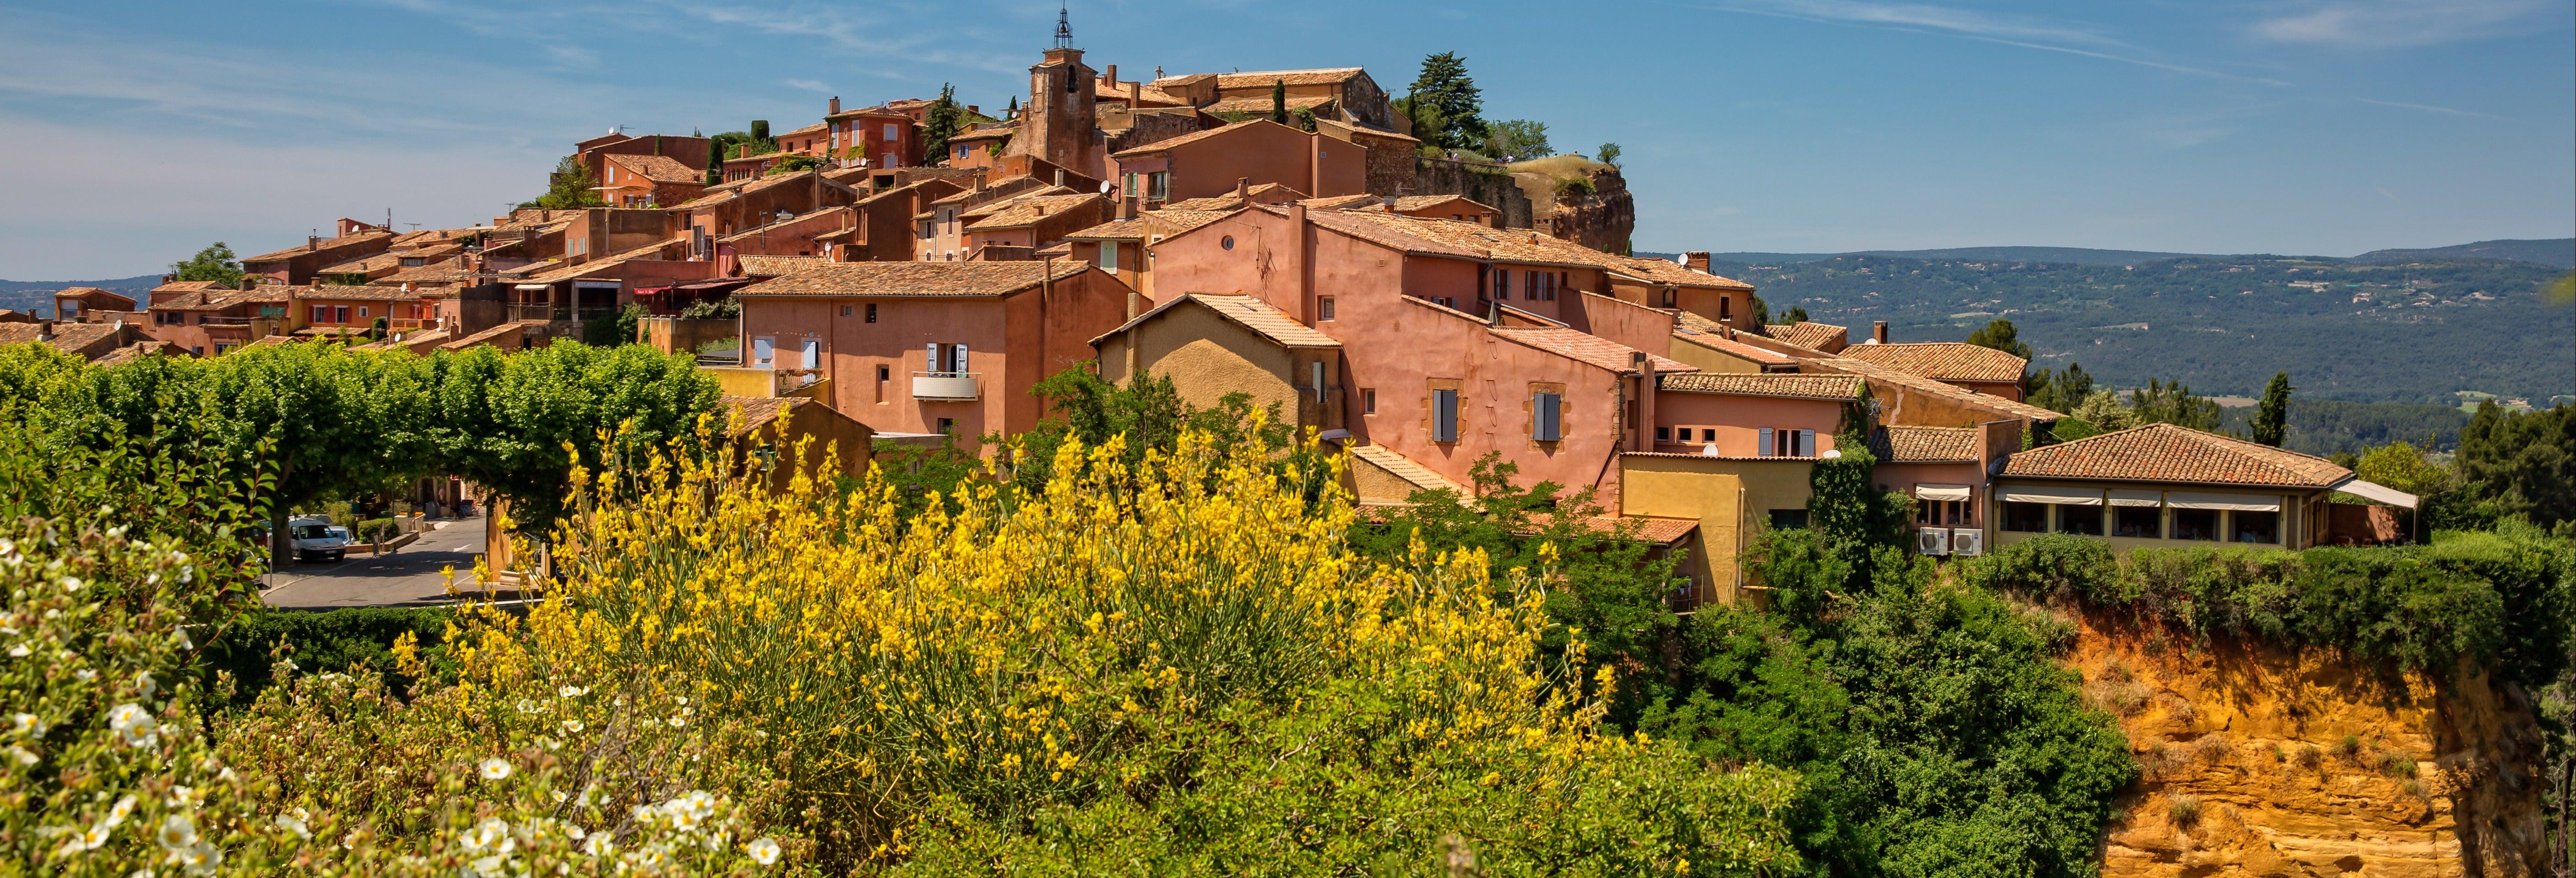 Excursión a Roussillon, Gordes, Lourmarin y Bonnieux